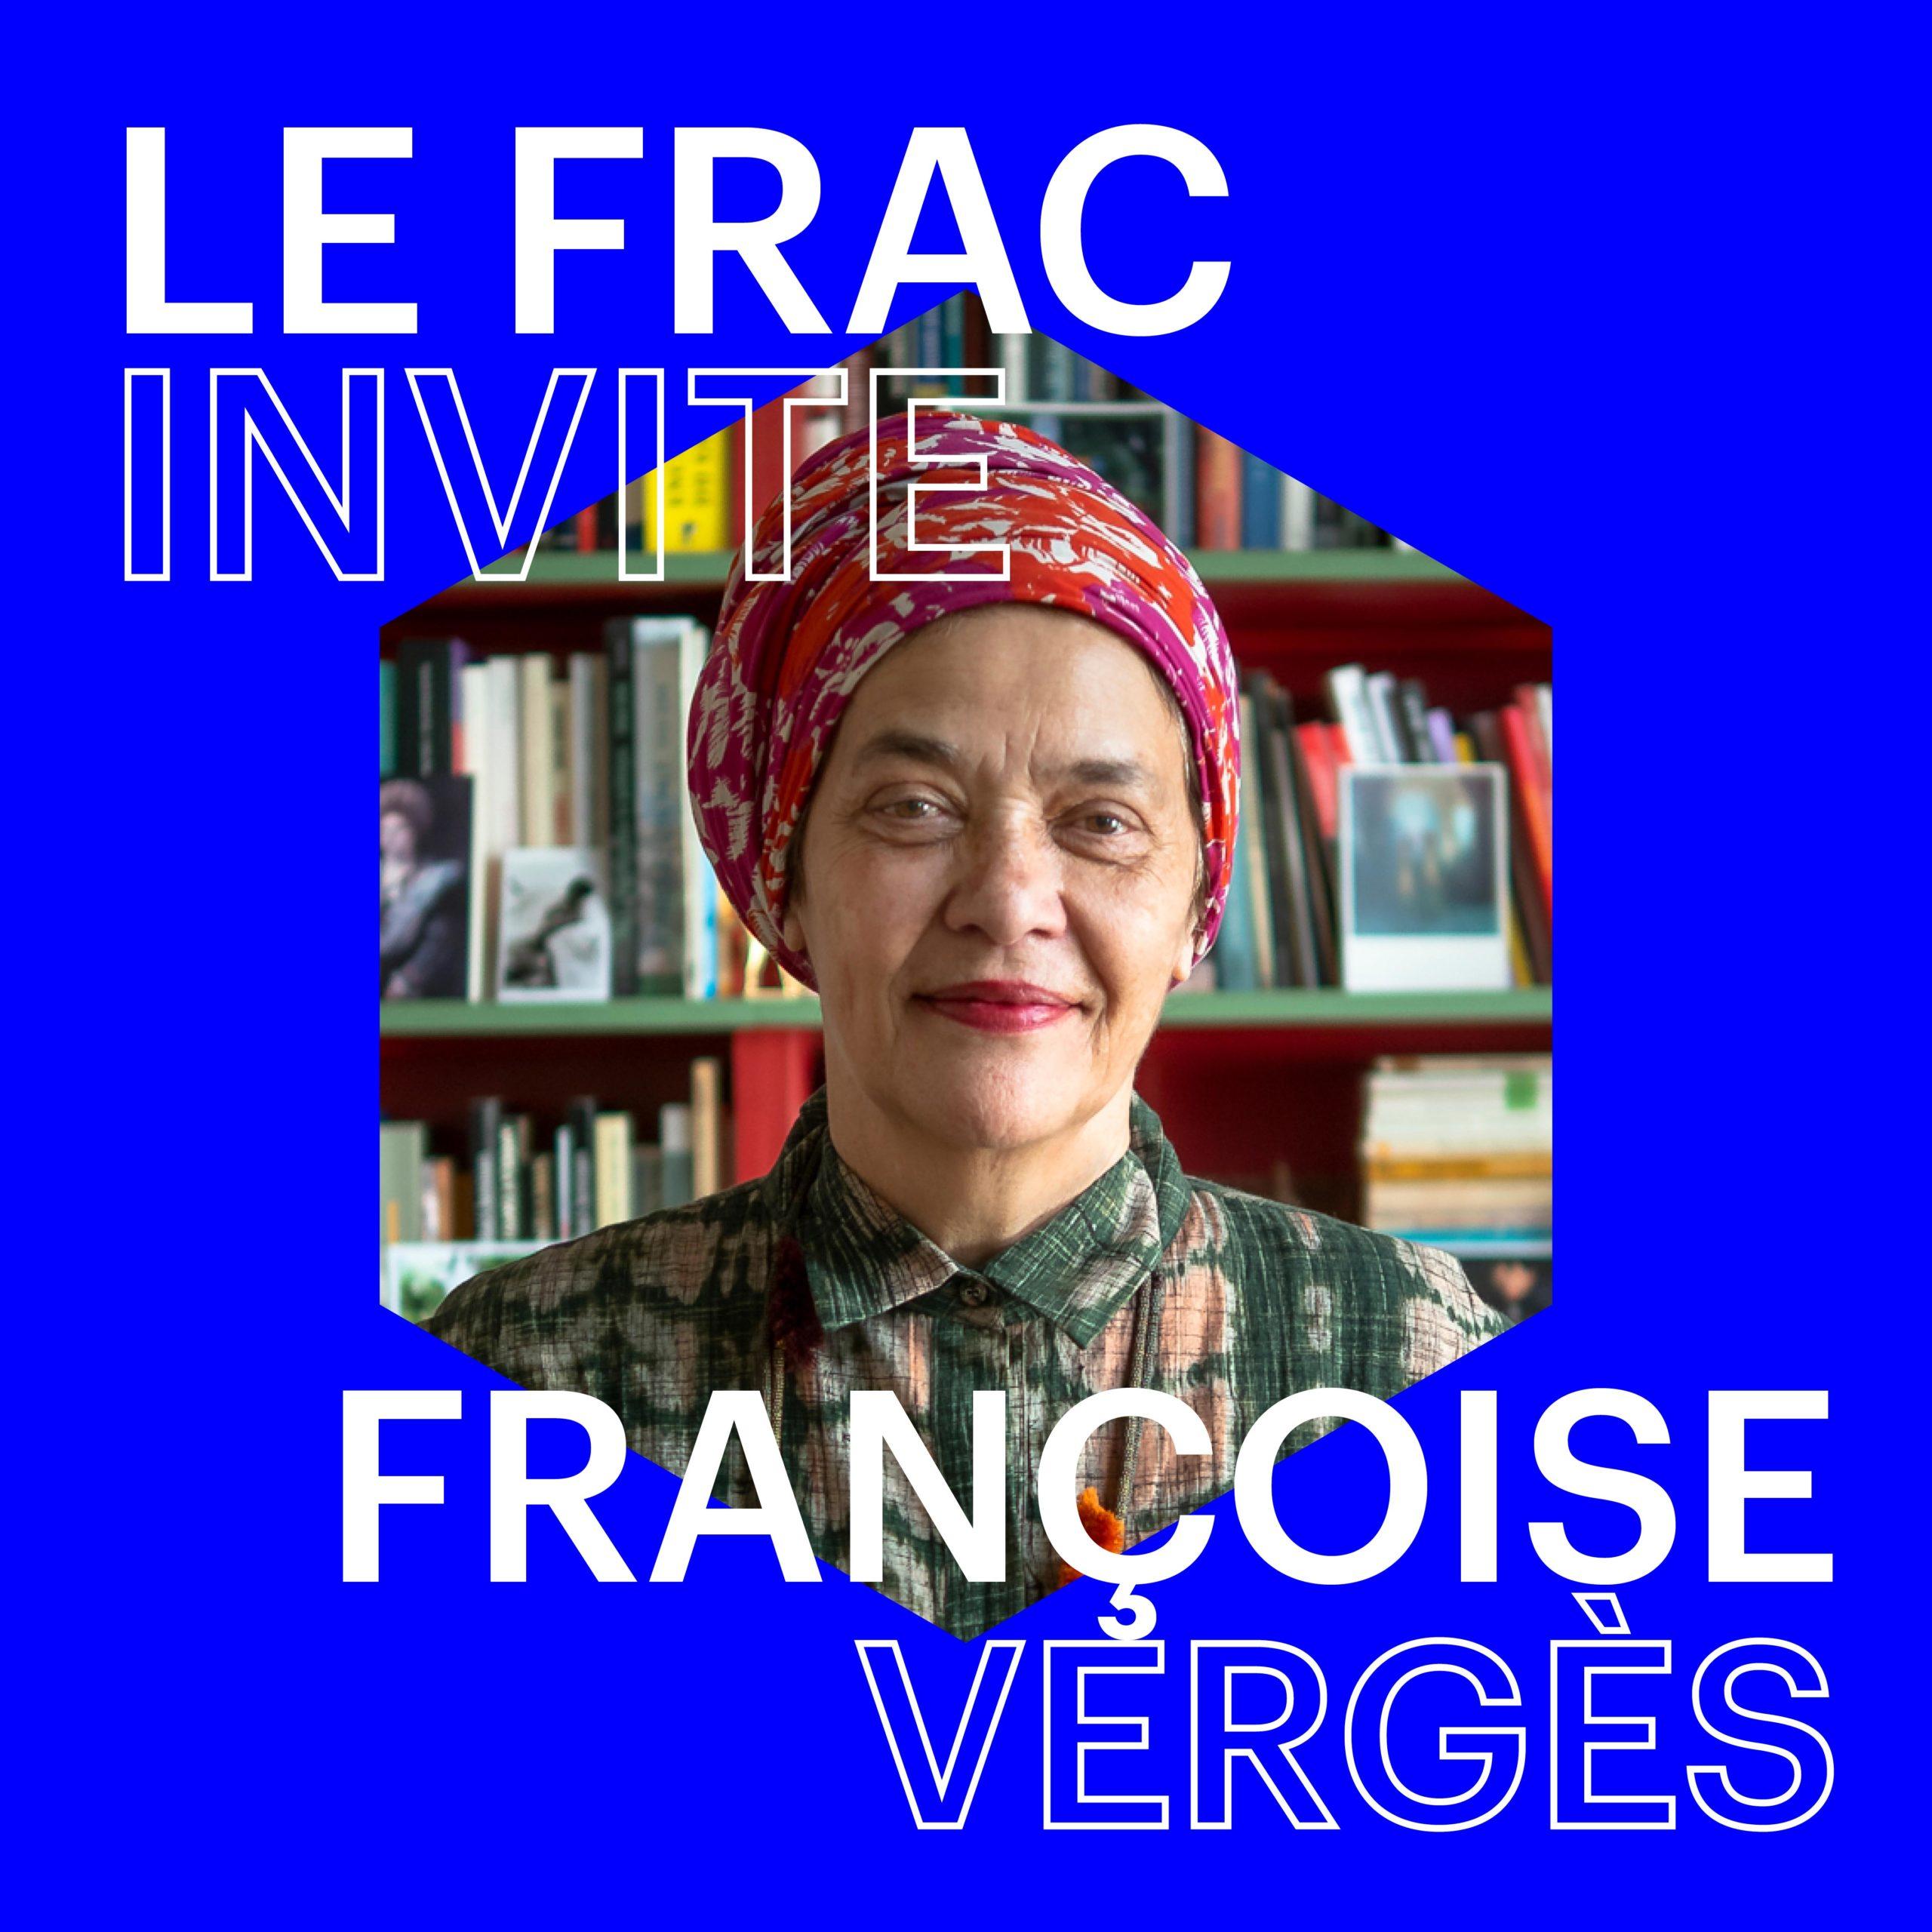 Françoise Vergès WEFRAC 2021